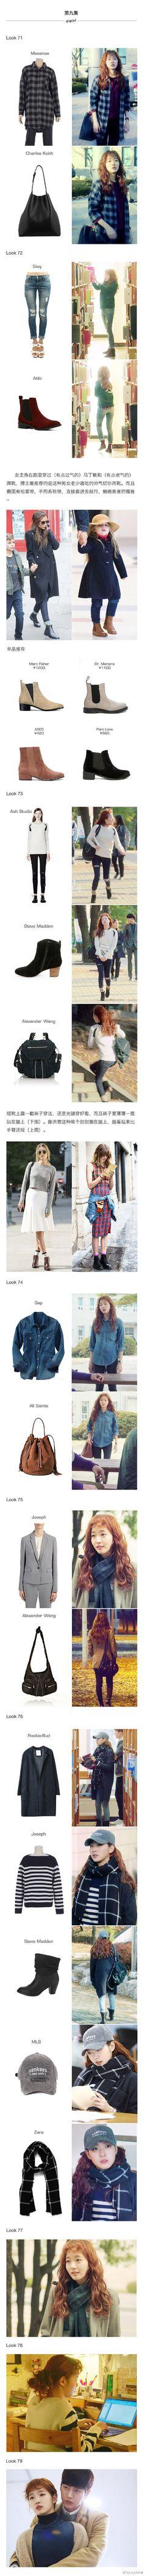 《乳酪陷阱》大啊啊啊科普|看看人家怎麼把不貴的衣服穿漂亮 Korea Fashion, Kpop Fashion, Fashion Outfits, Womens Fashion, Fashion Ideas, Fashion Trends, Kim Go Eun Style, My Style, Casual Work Outfits